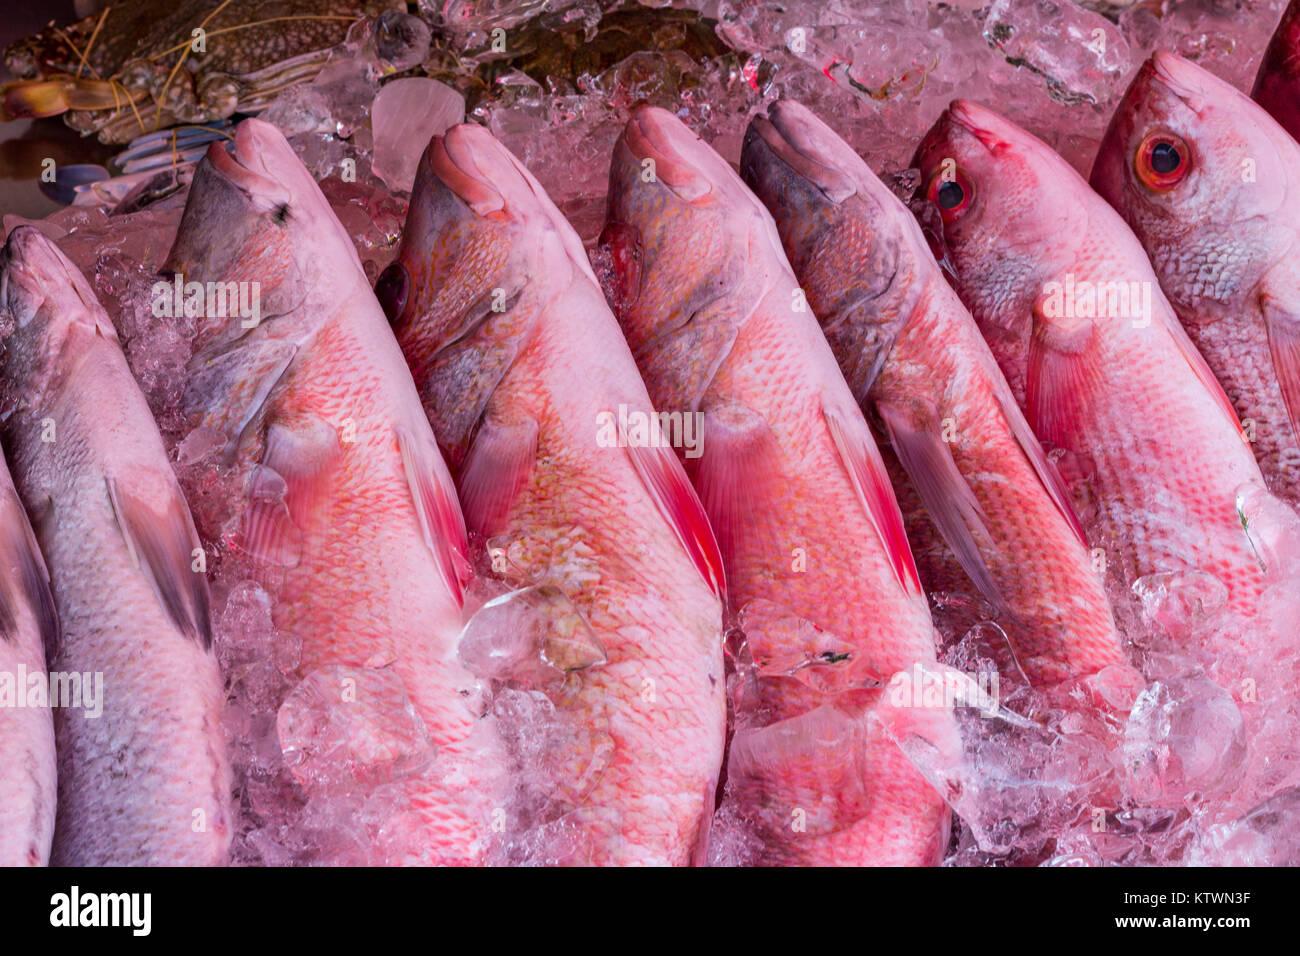 Red snapper fish on ice, fish market, Rawai, Phuket, Thailand Stock Photo